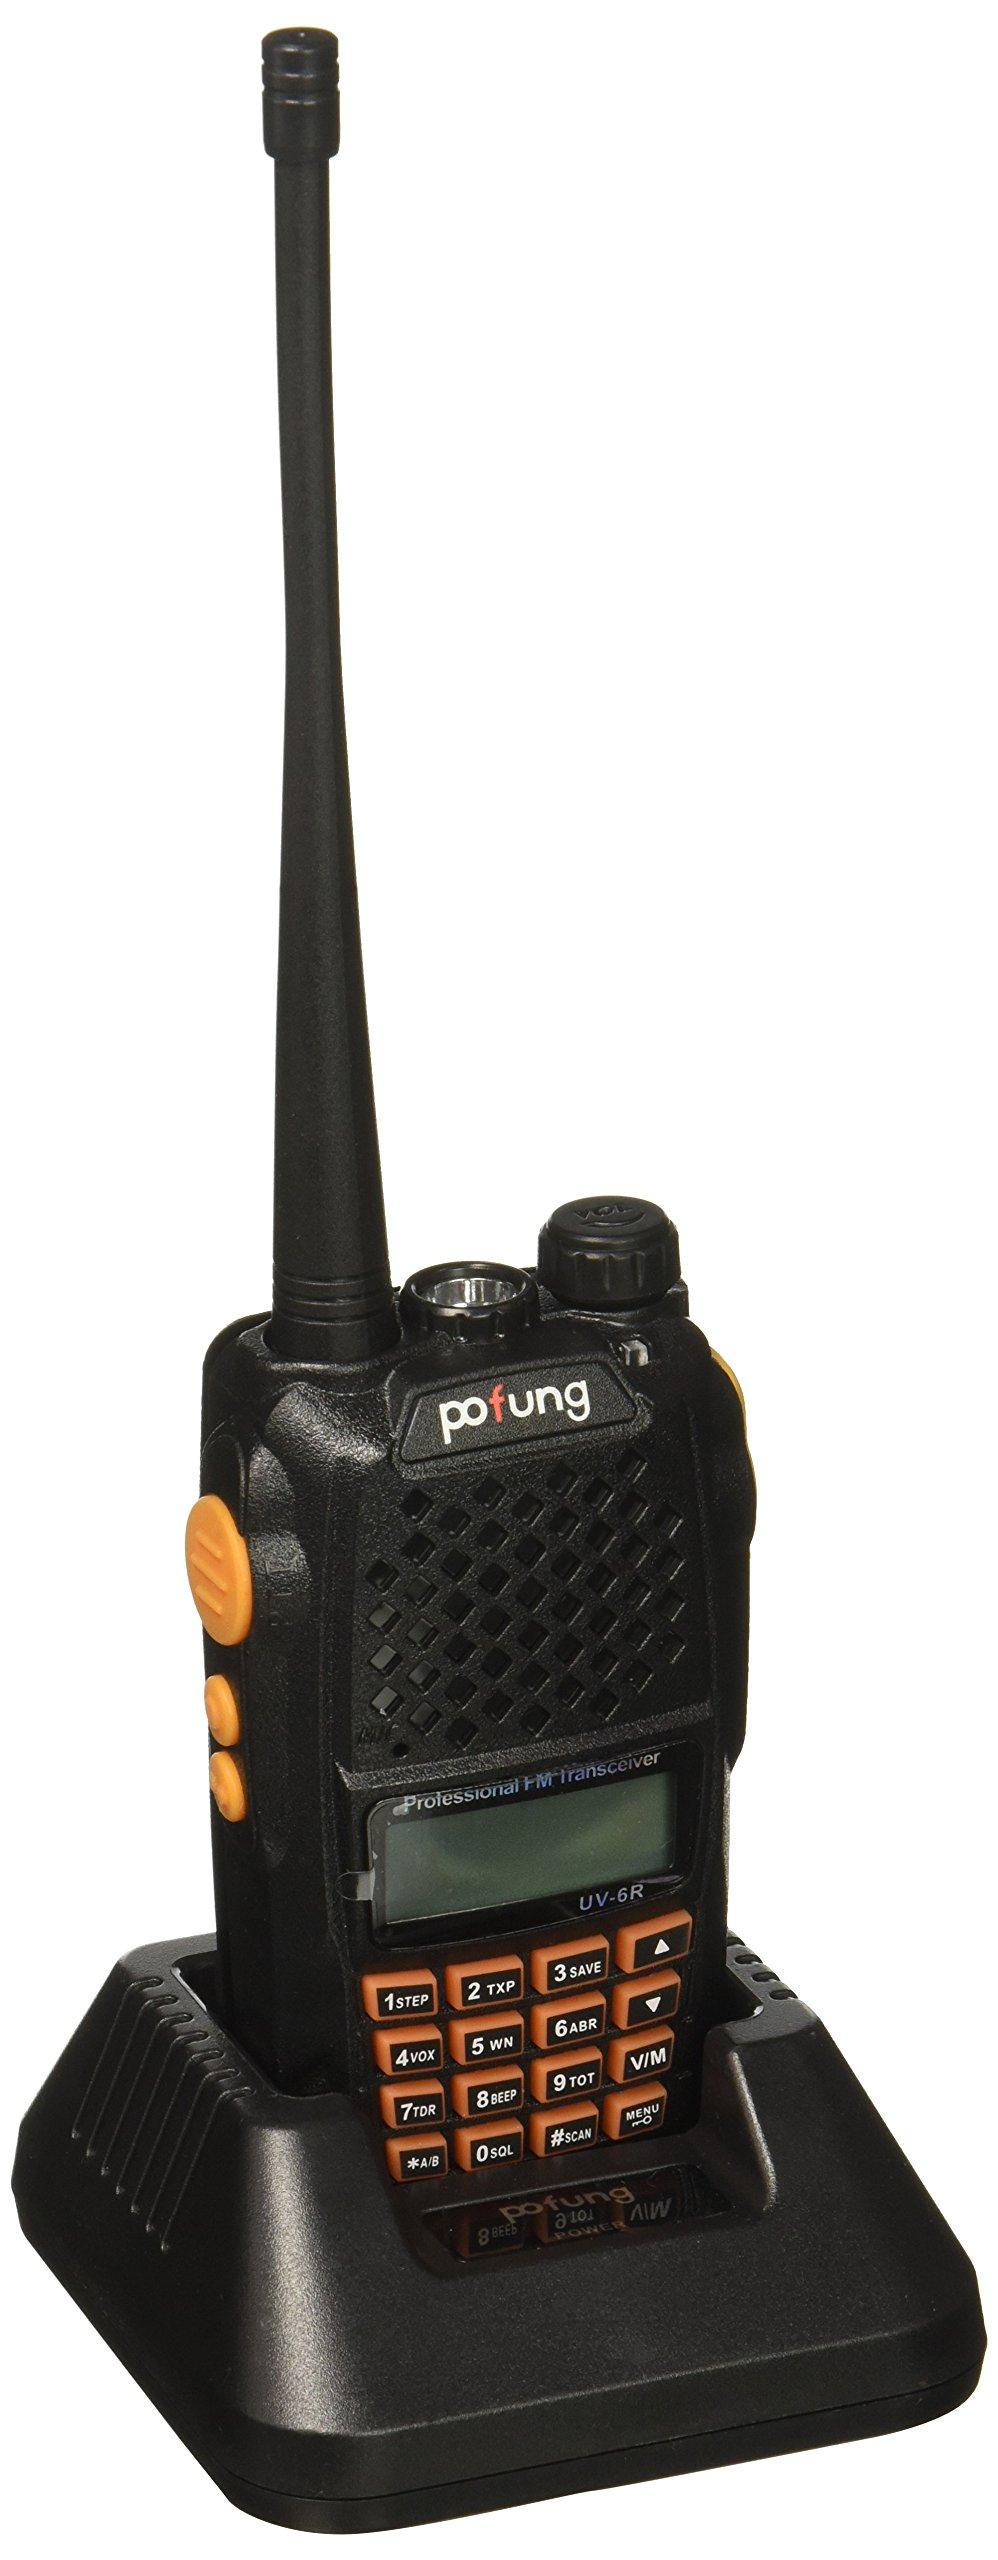 Baofeng Pofung UV-6R Dual-Band Two-Way Radio Transceiver 136-174/400-520MHz High Power 5W/1W, 65-108MHz FM Two-Way Radio